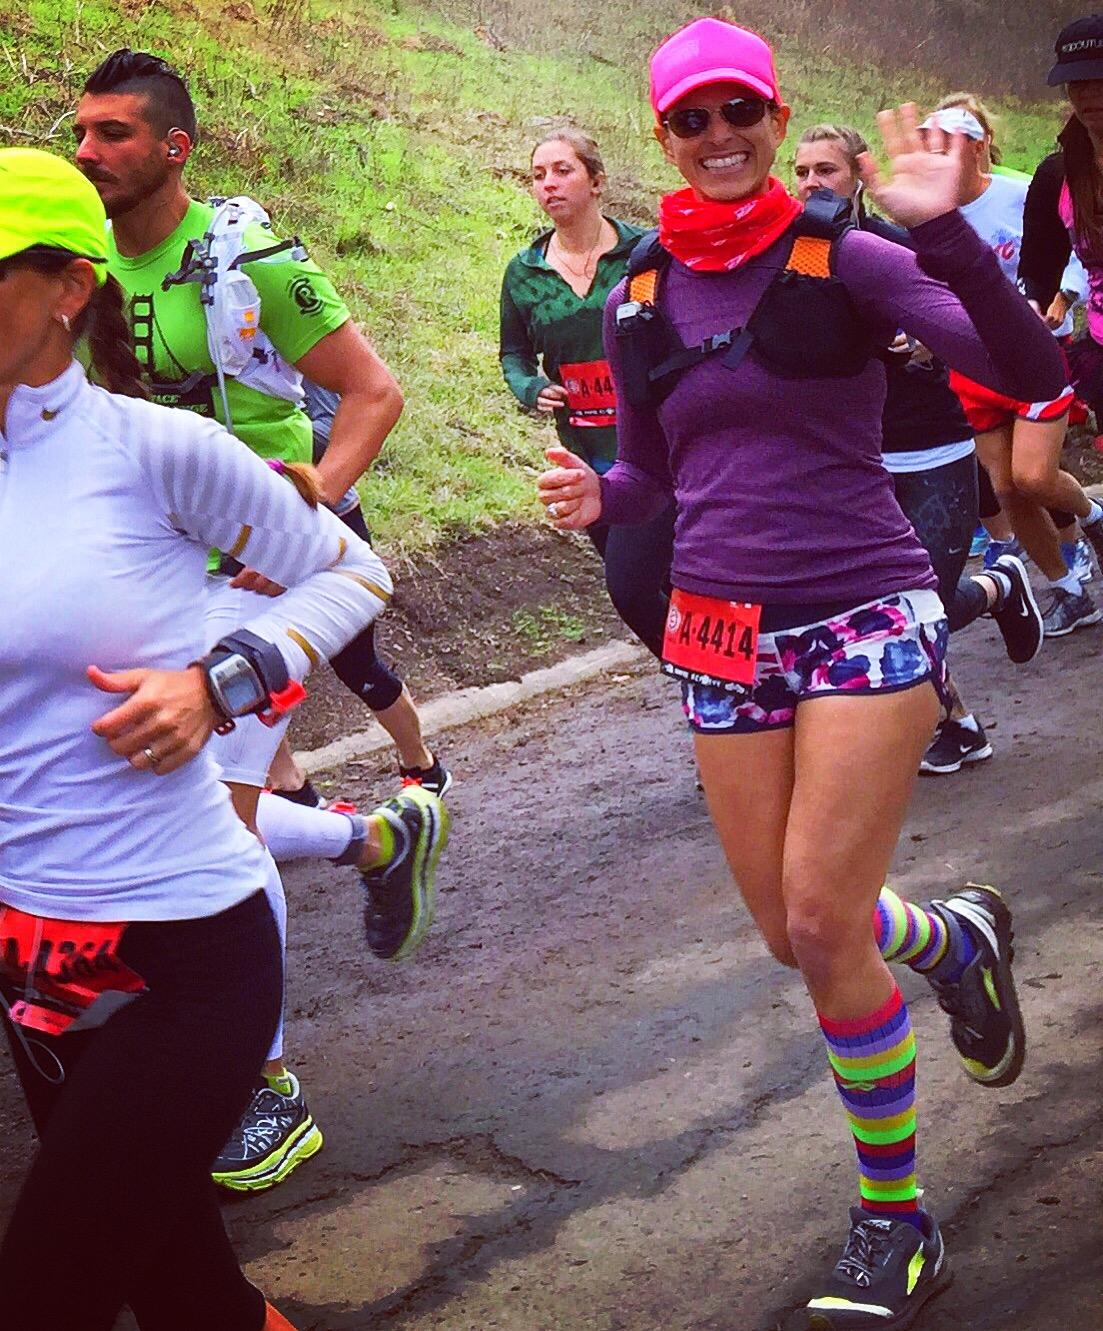 The North Face Endurance Challenge, California, Marathon Relay, Trail Running, orange mud, altra running, lululemon, procompression